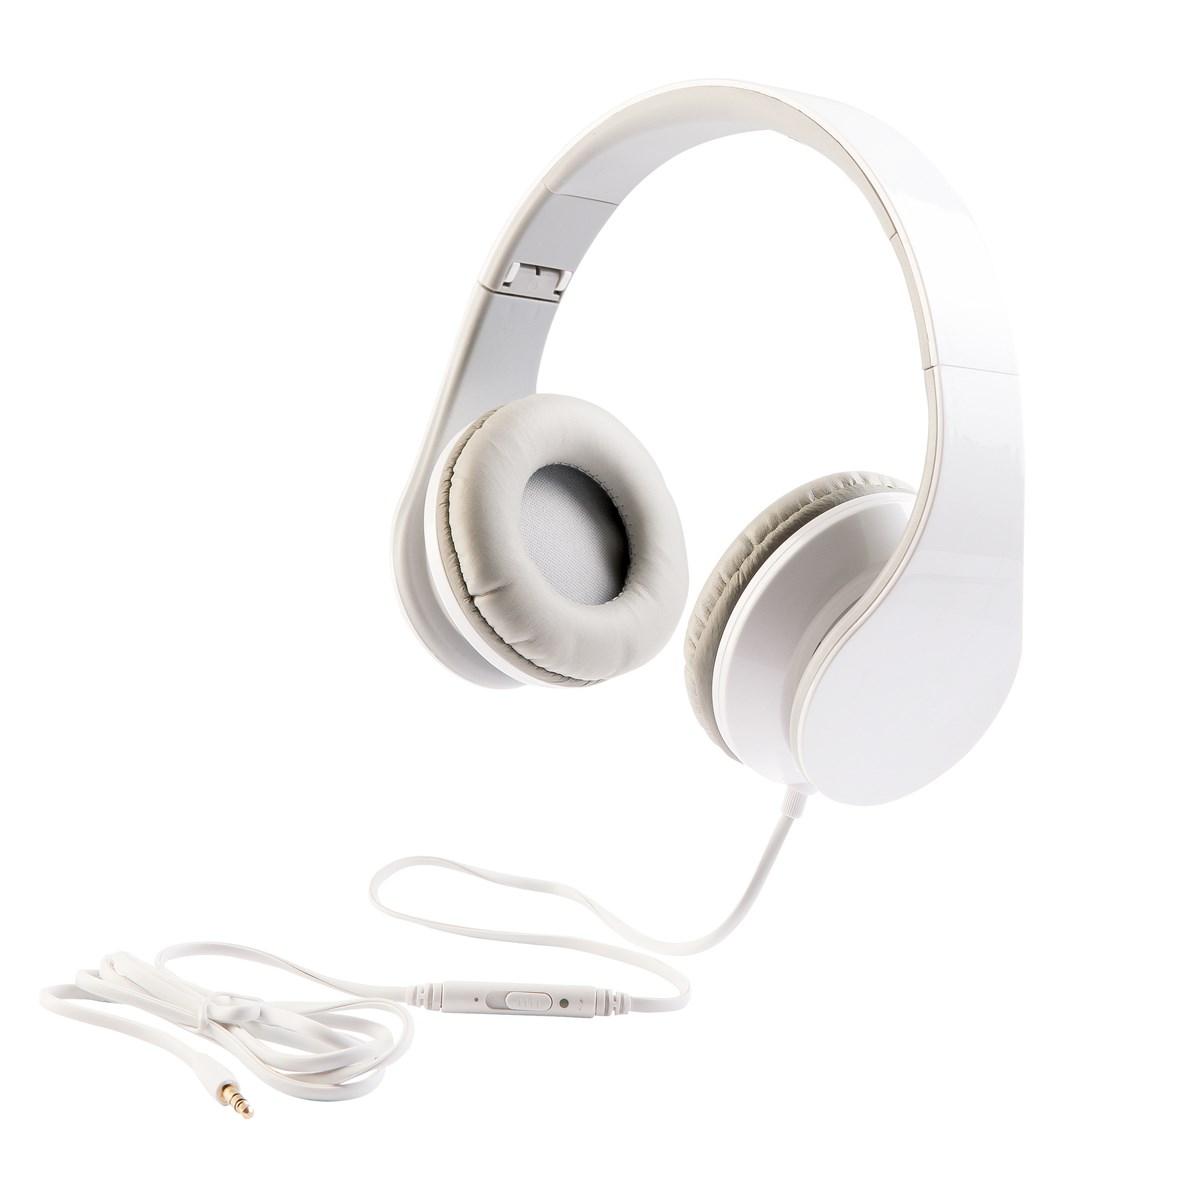 Livoo Casque stereo Hi-Fi en Plastique Blanc